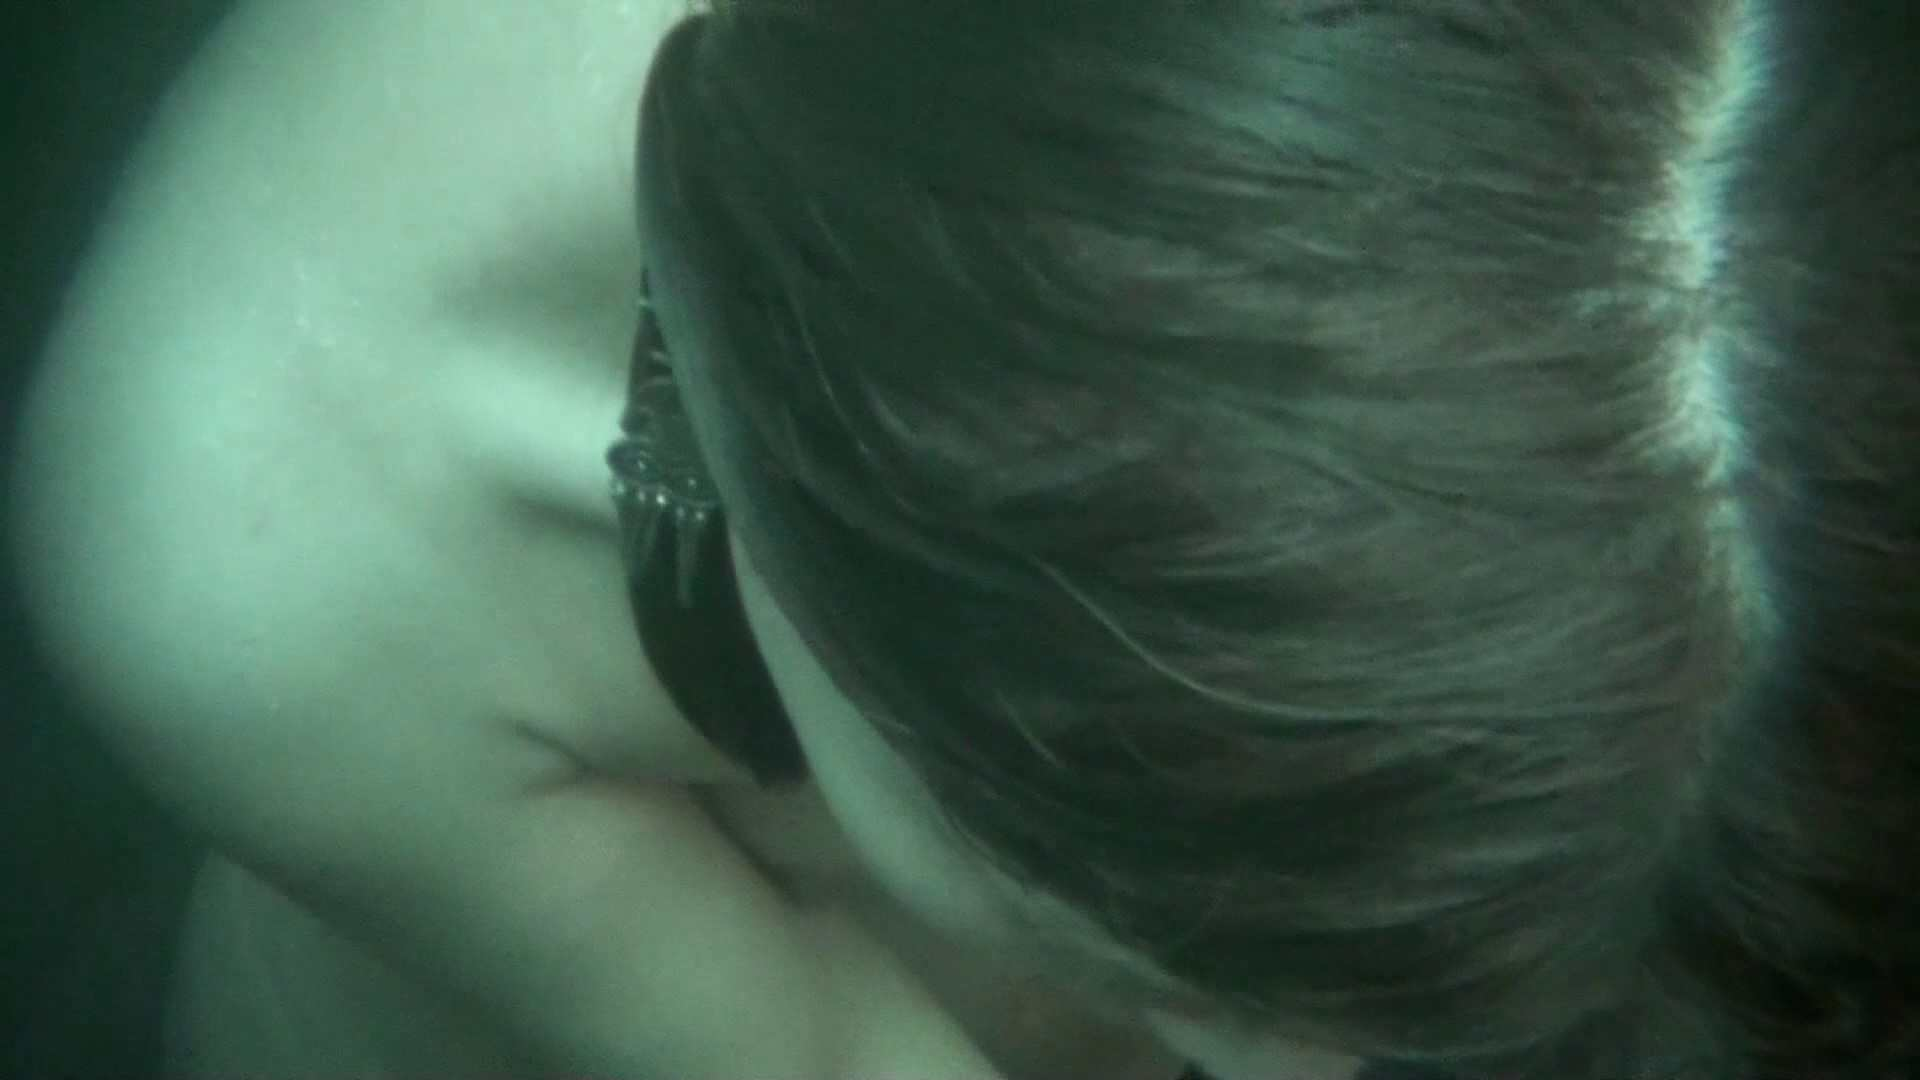 Vol.12 女性の性器には予想外の砂が混入しているようです。 シャワー中 | 高画質  96連発 79